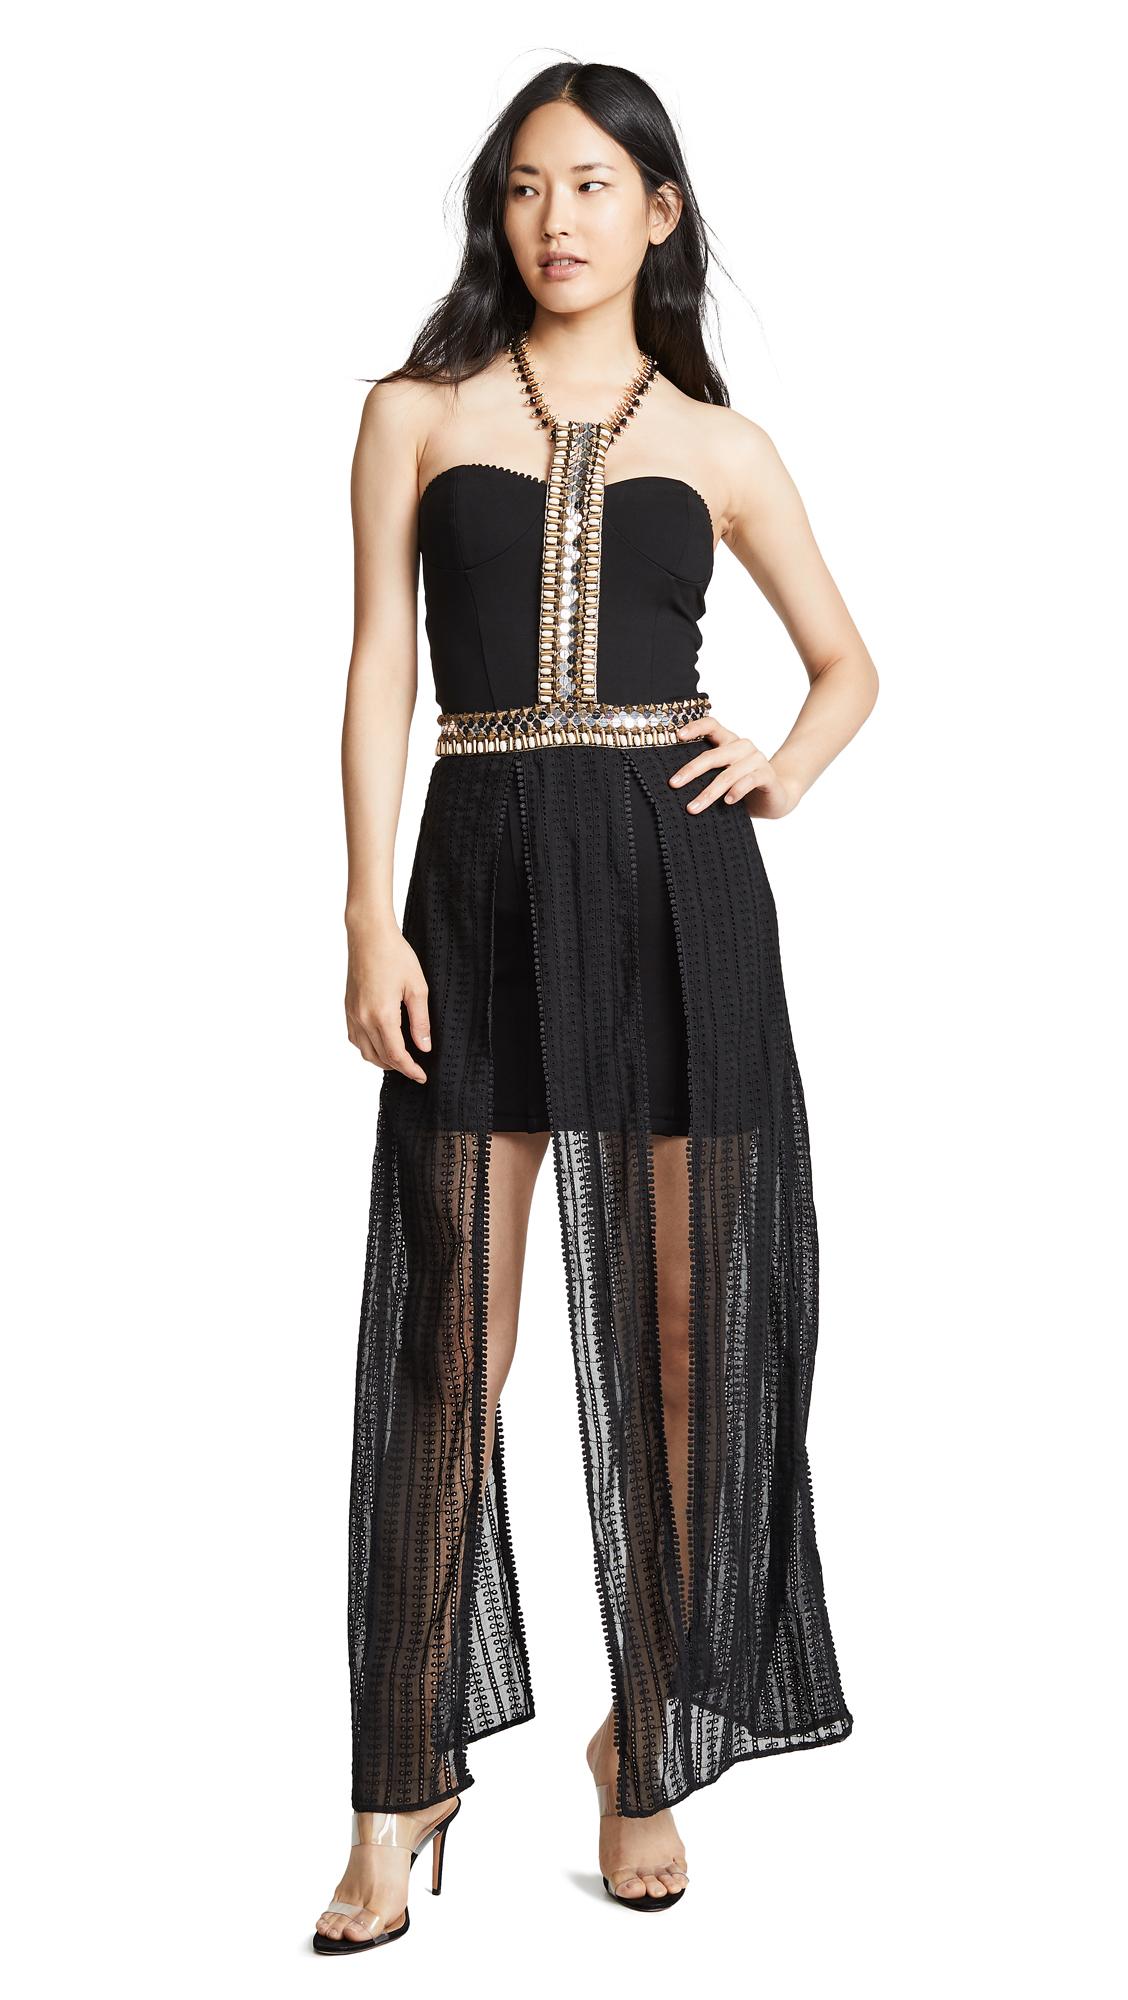 Ixiah Zusonic 2 Piece Dress In Black